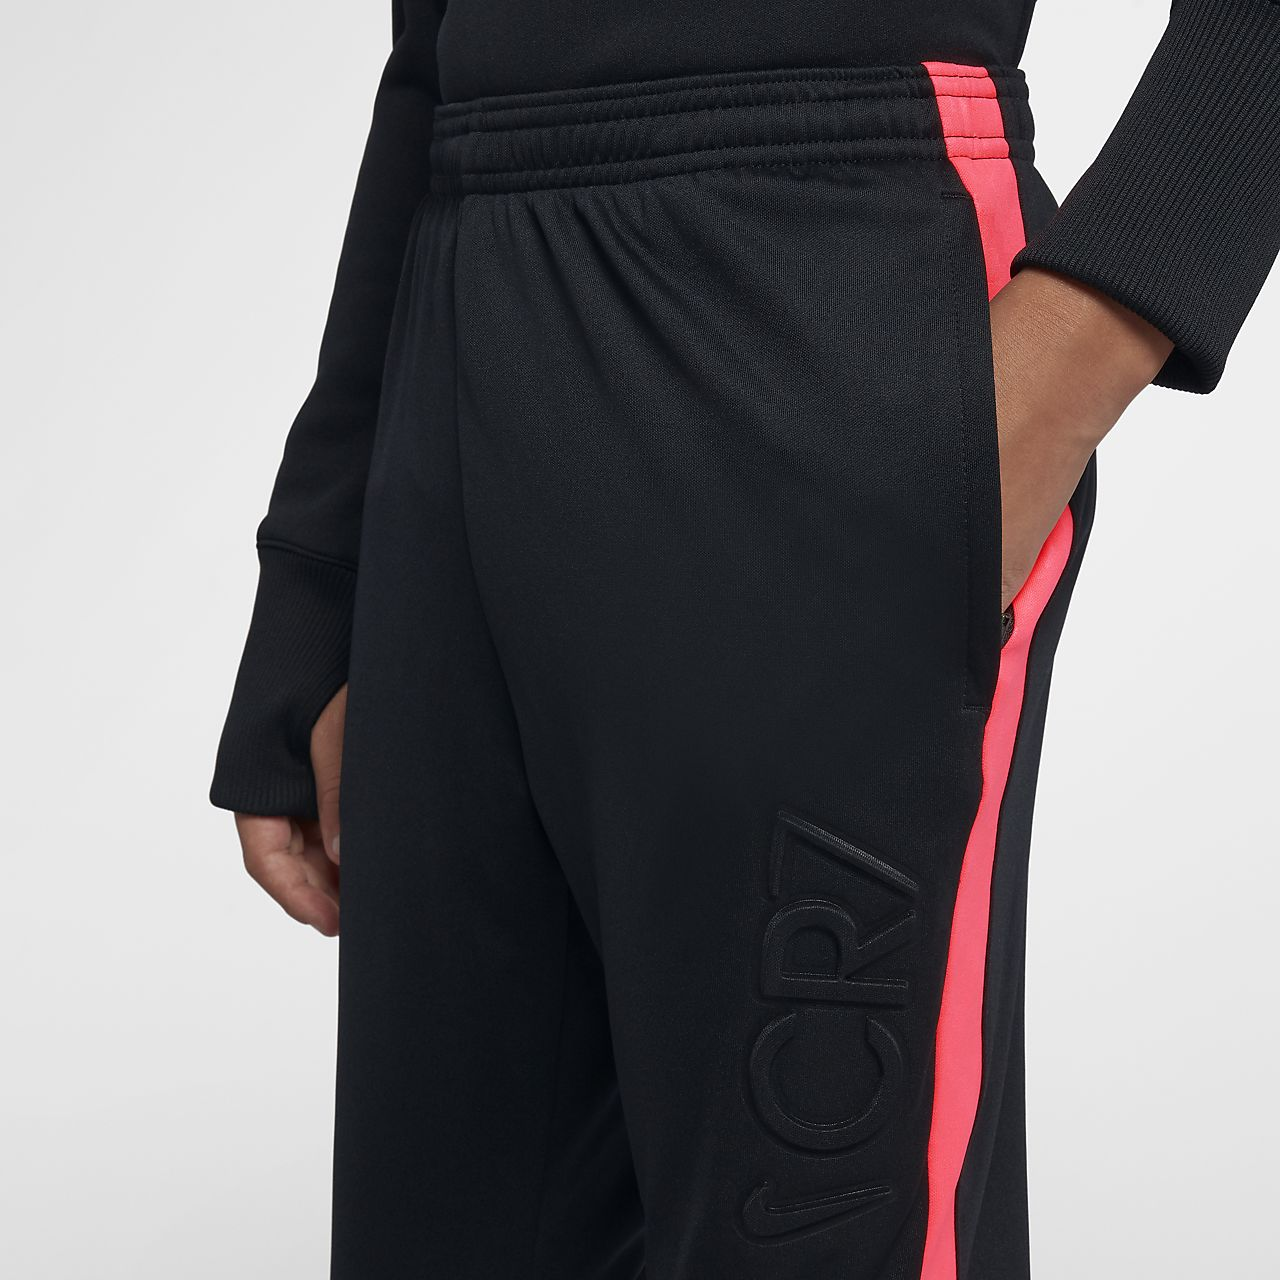 c70aa8049 Nike Dri-FIT CR7 Older Kids  Football Pants. Nike.com MY